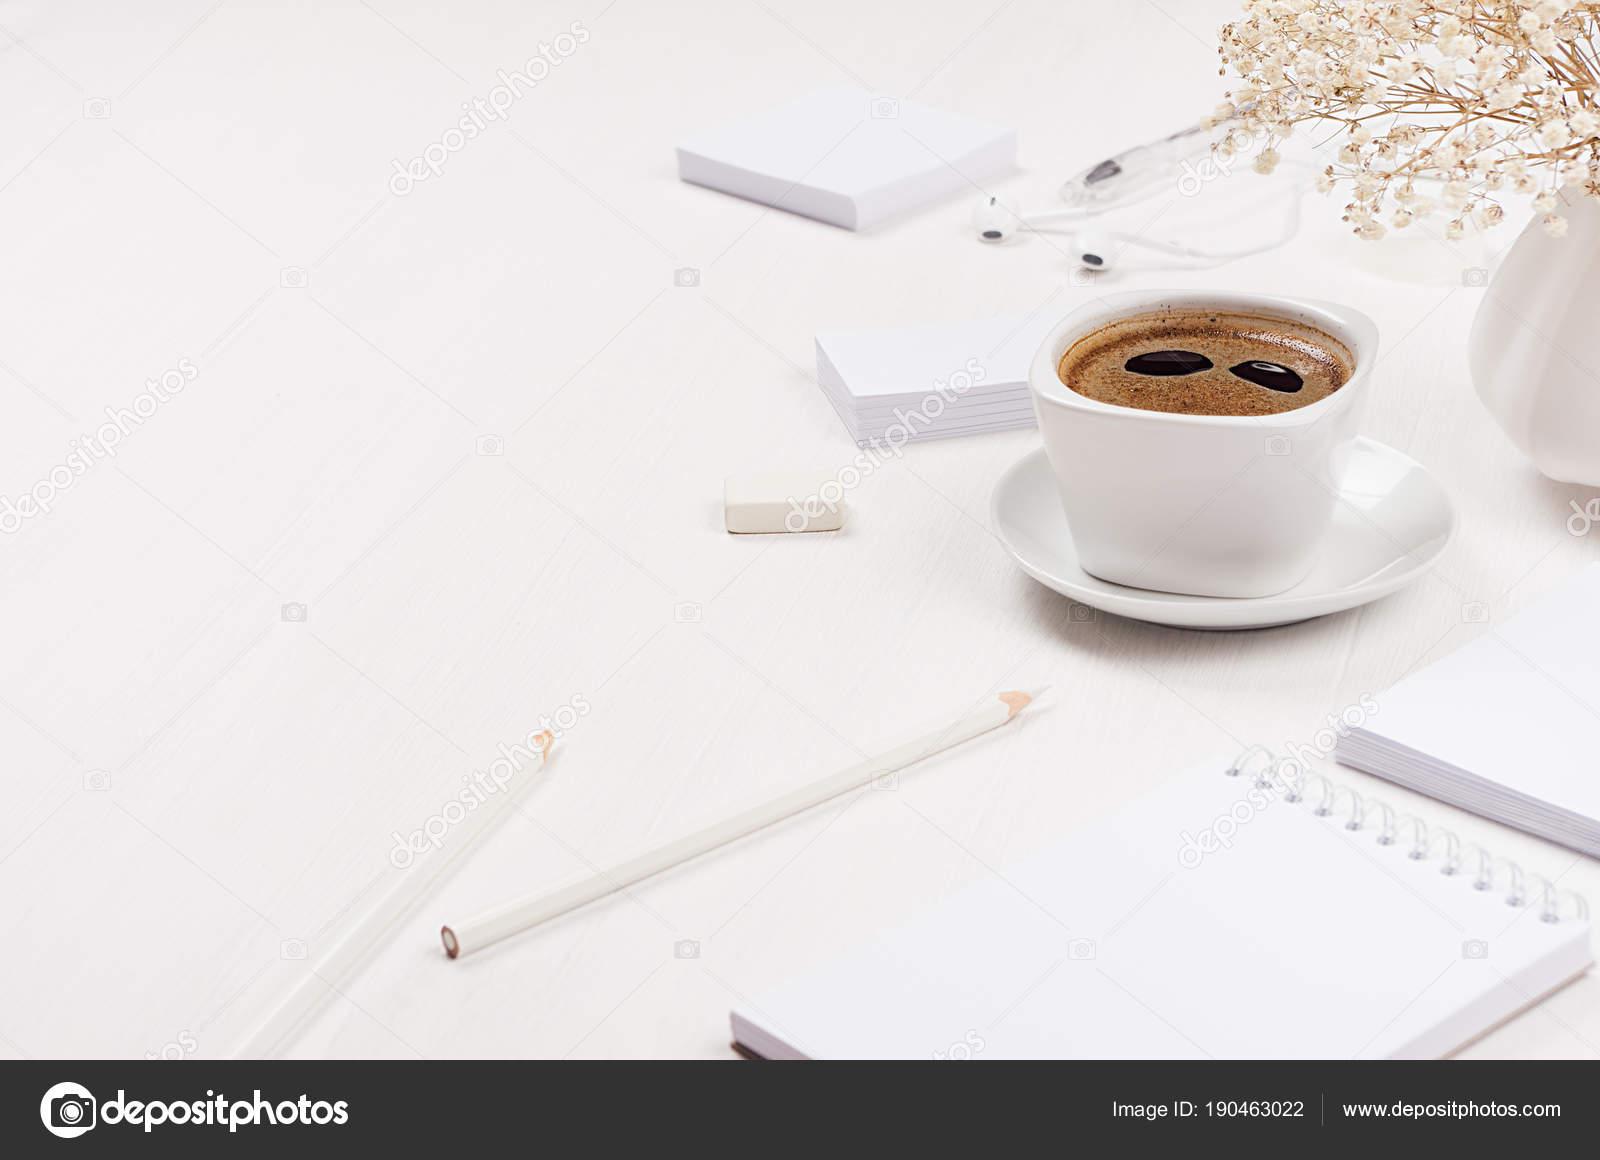 Moderne simple lieu travail papeterie bureau blanc serti tasse café